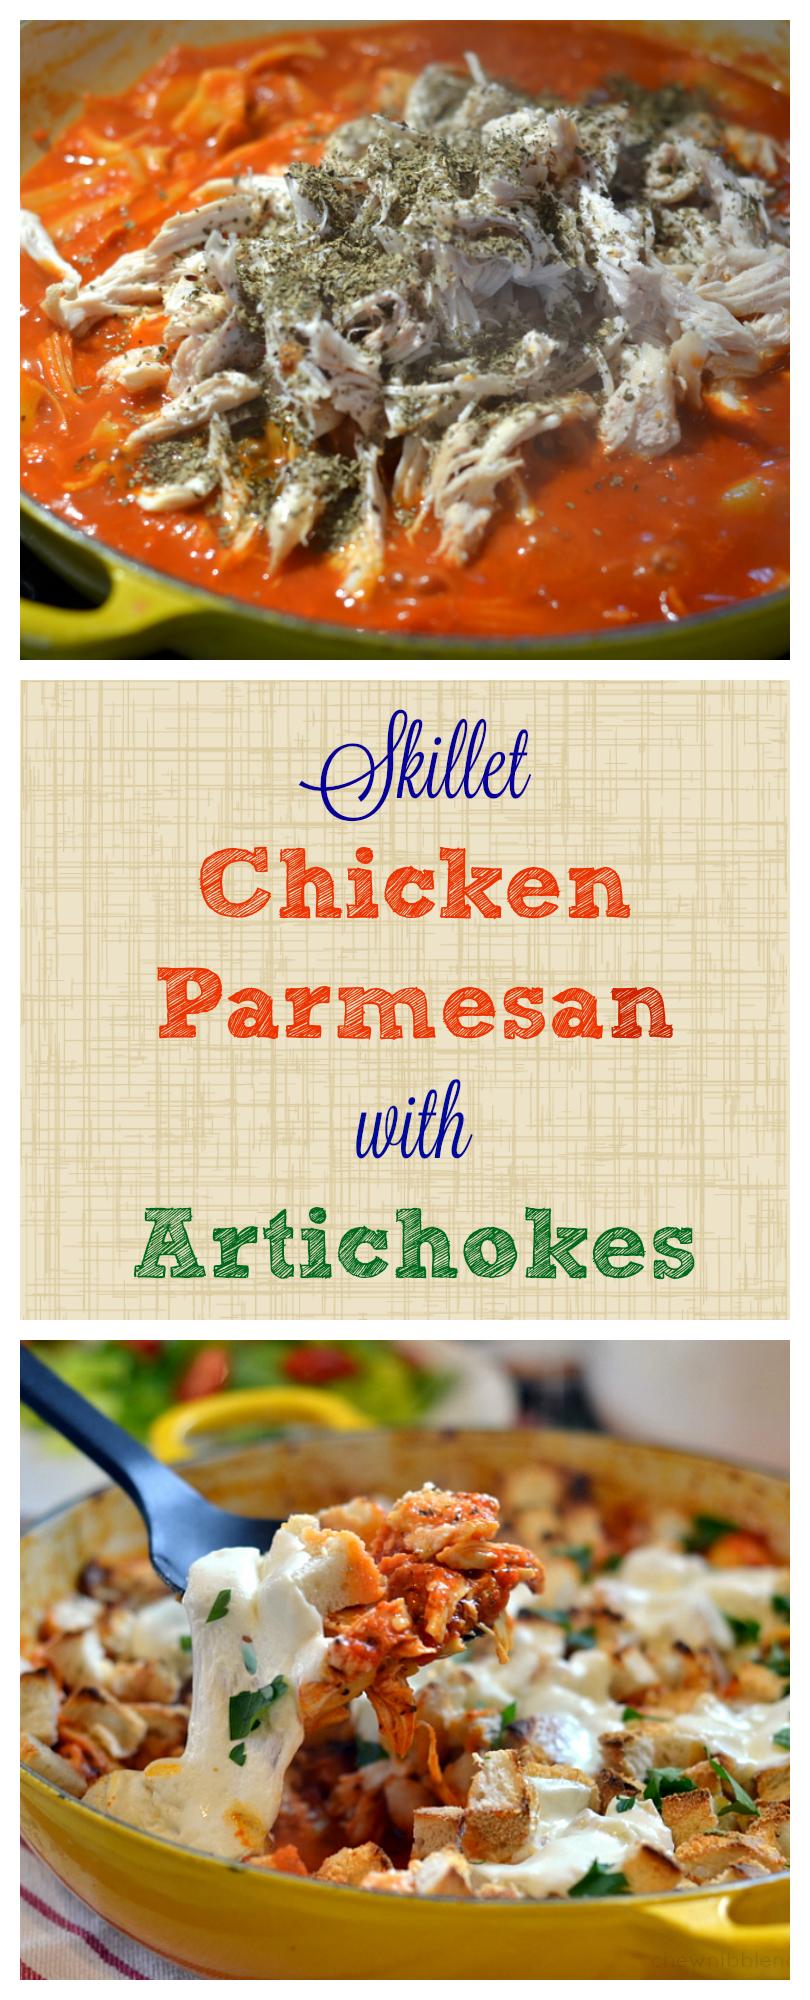 Skillet Chicken Parmesan with Artichokes - Chew Nibble Nosh